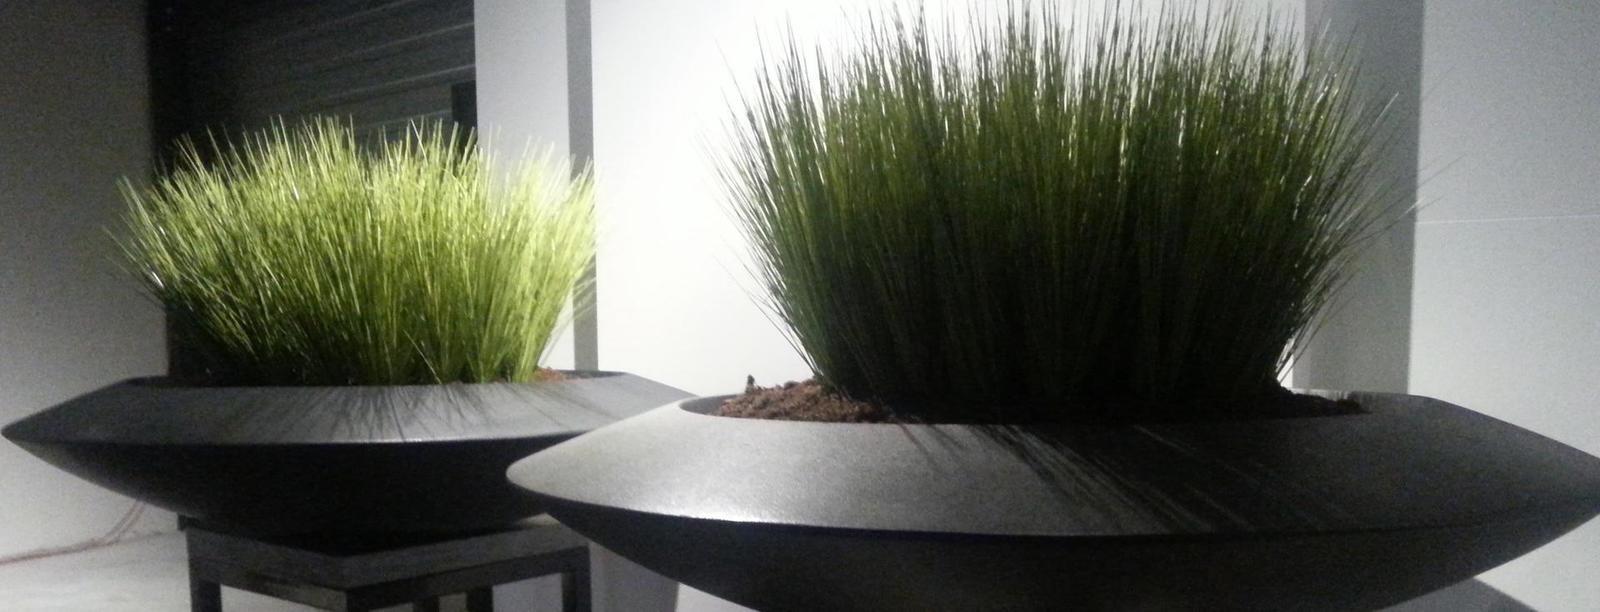 Joachim Normon - Plantenbakken